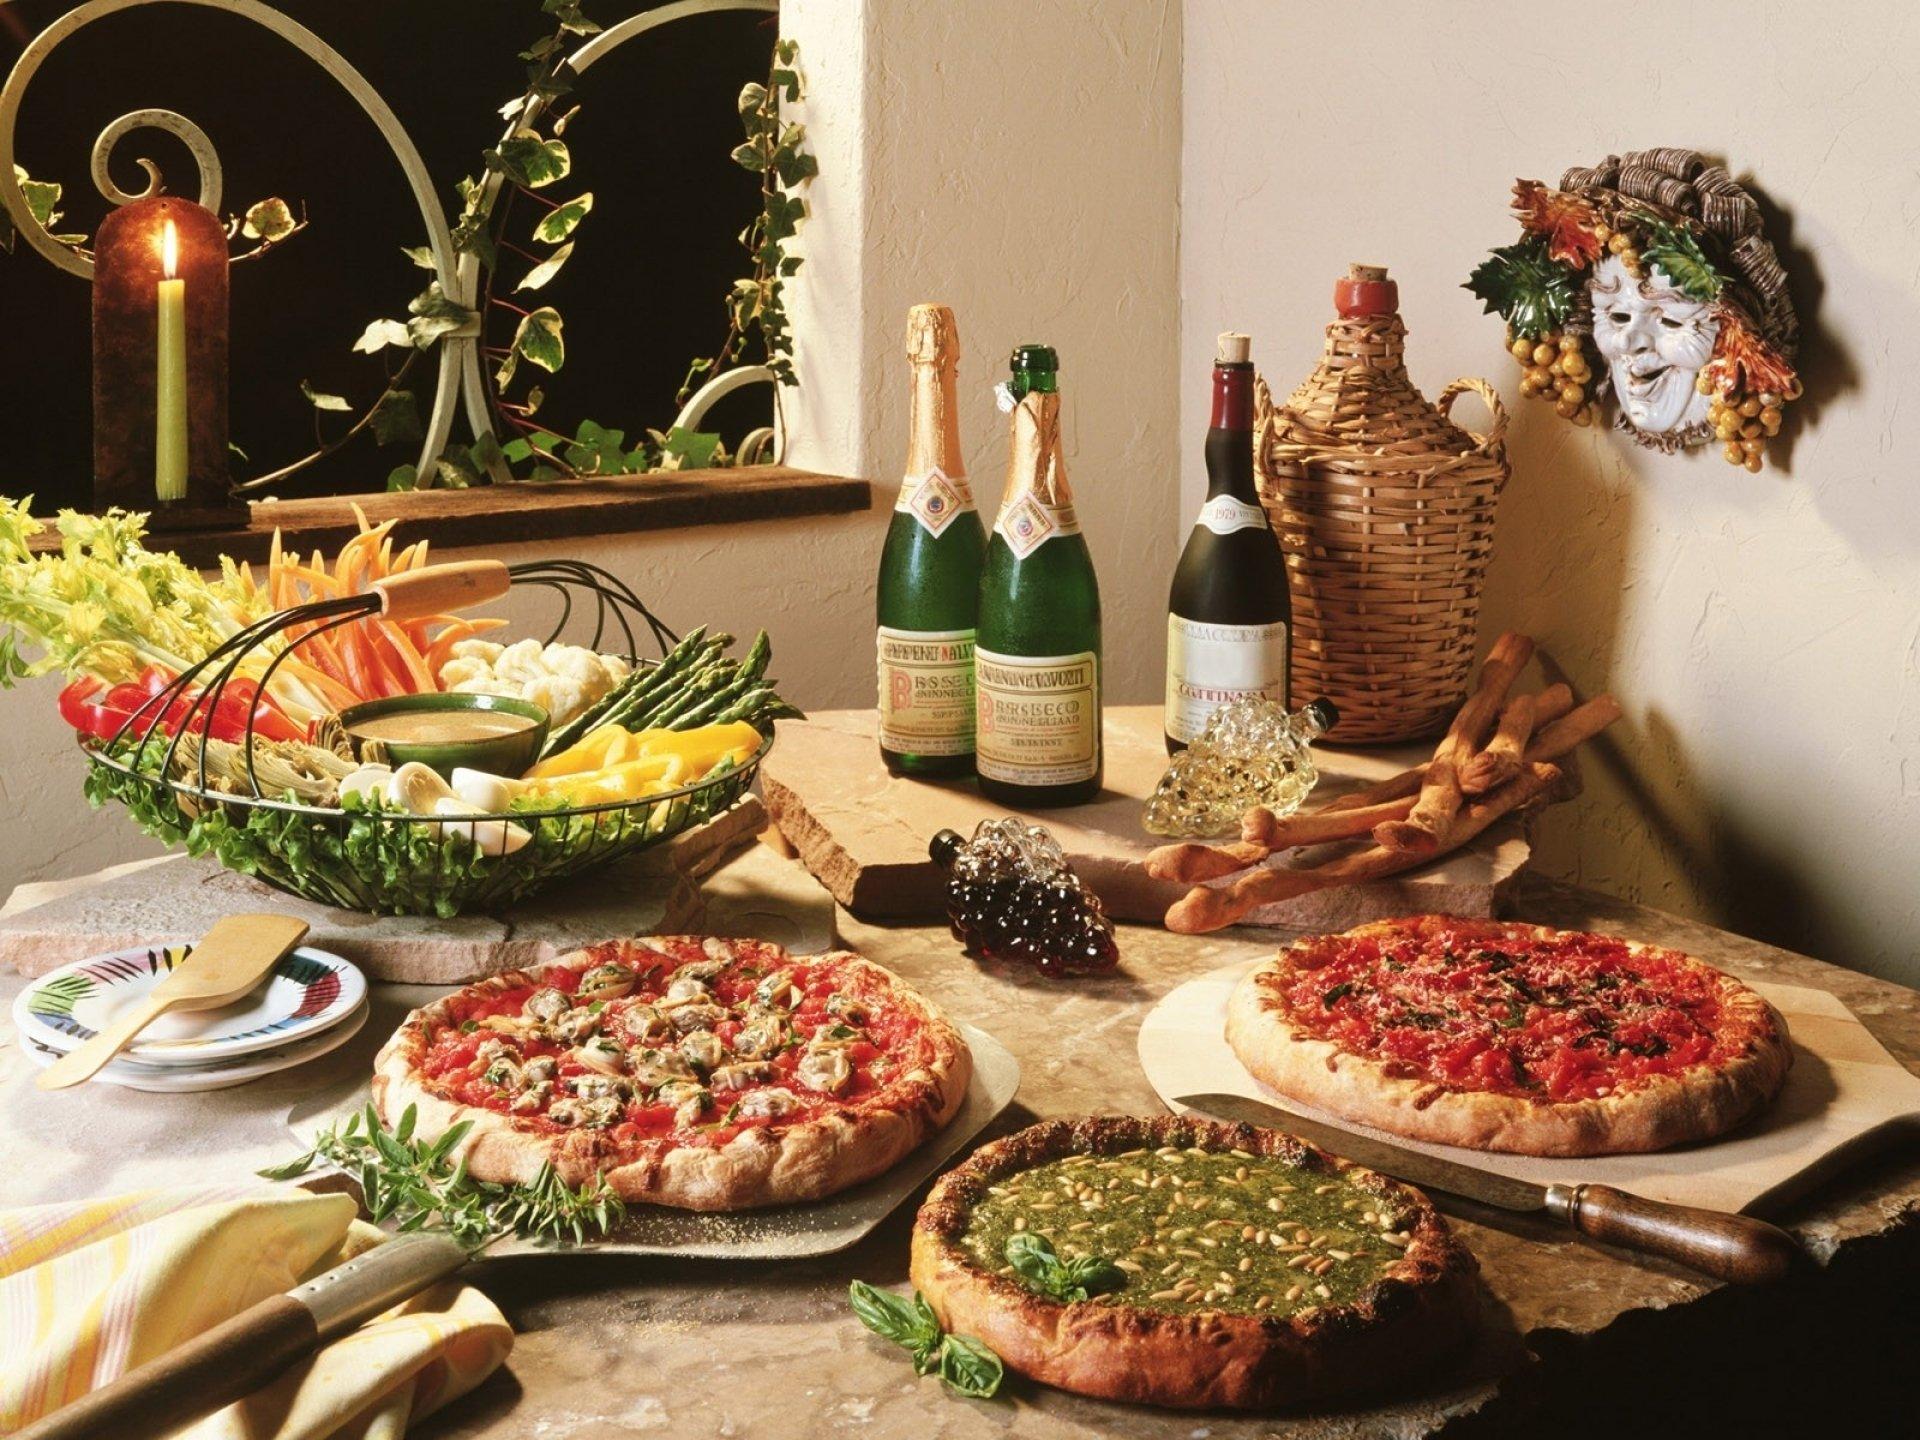 Food - Pizza  Food Italian Wine Meal Lunch Vegetable Wallpaper